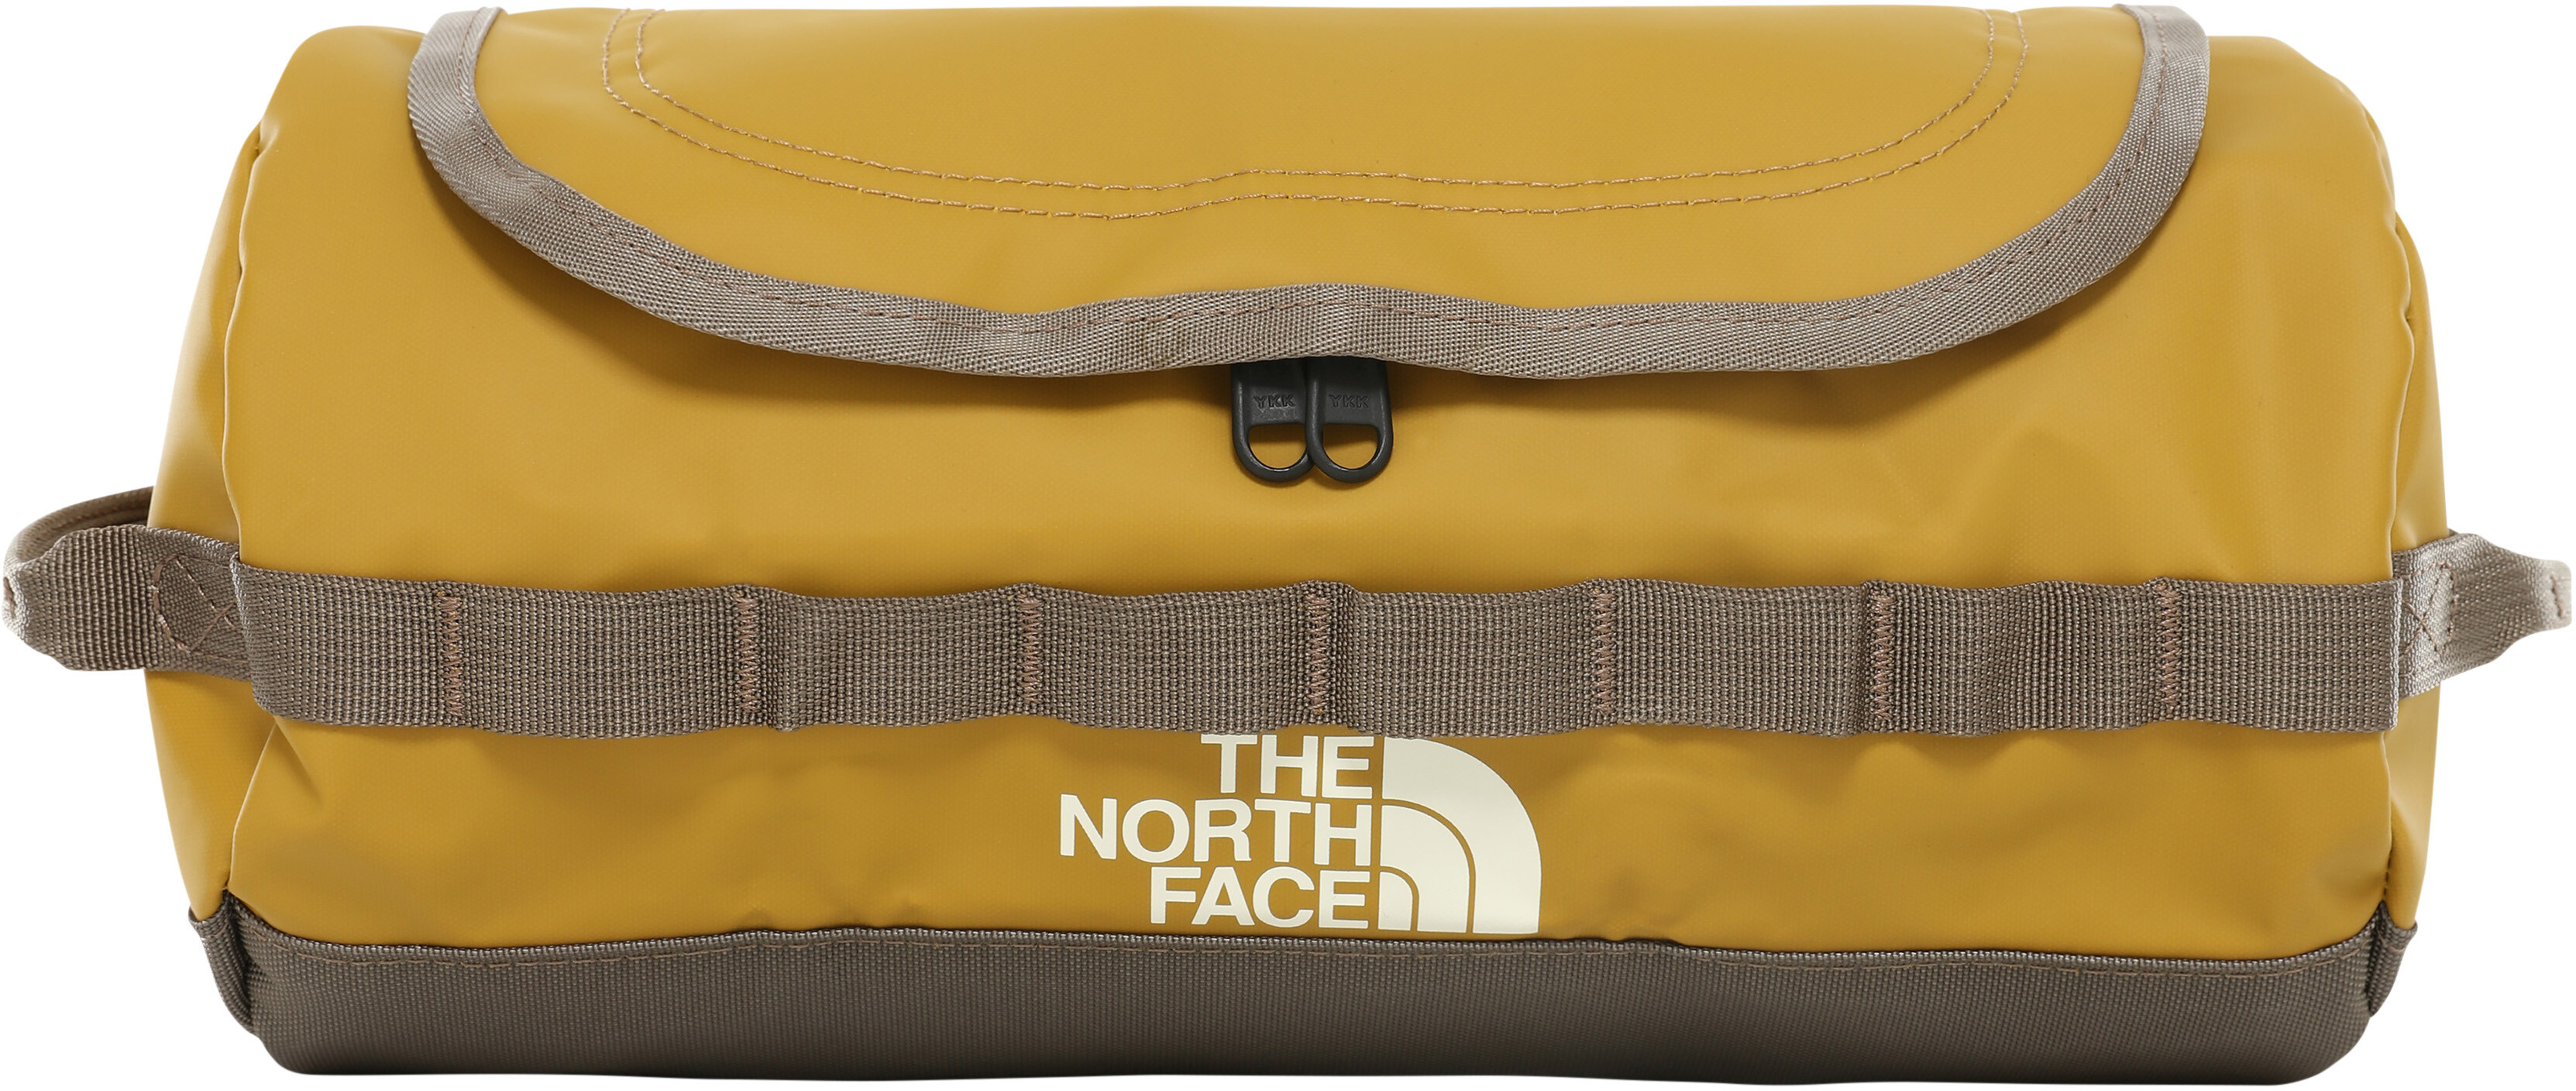 02da26c83 The North Face Base Camp Travel Canister L British Khaki/Weimaraner Brown